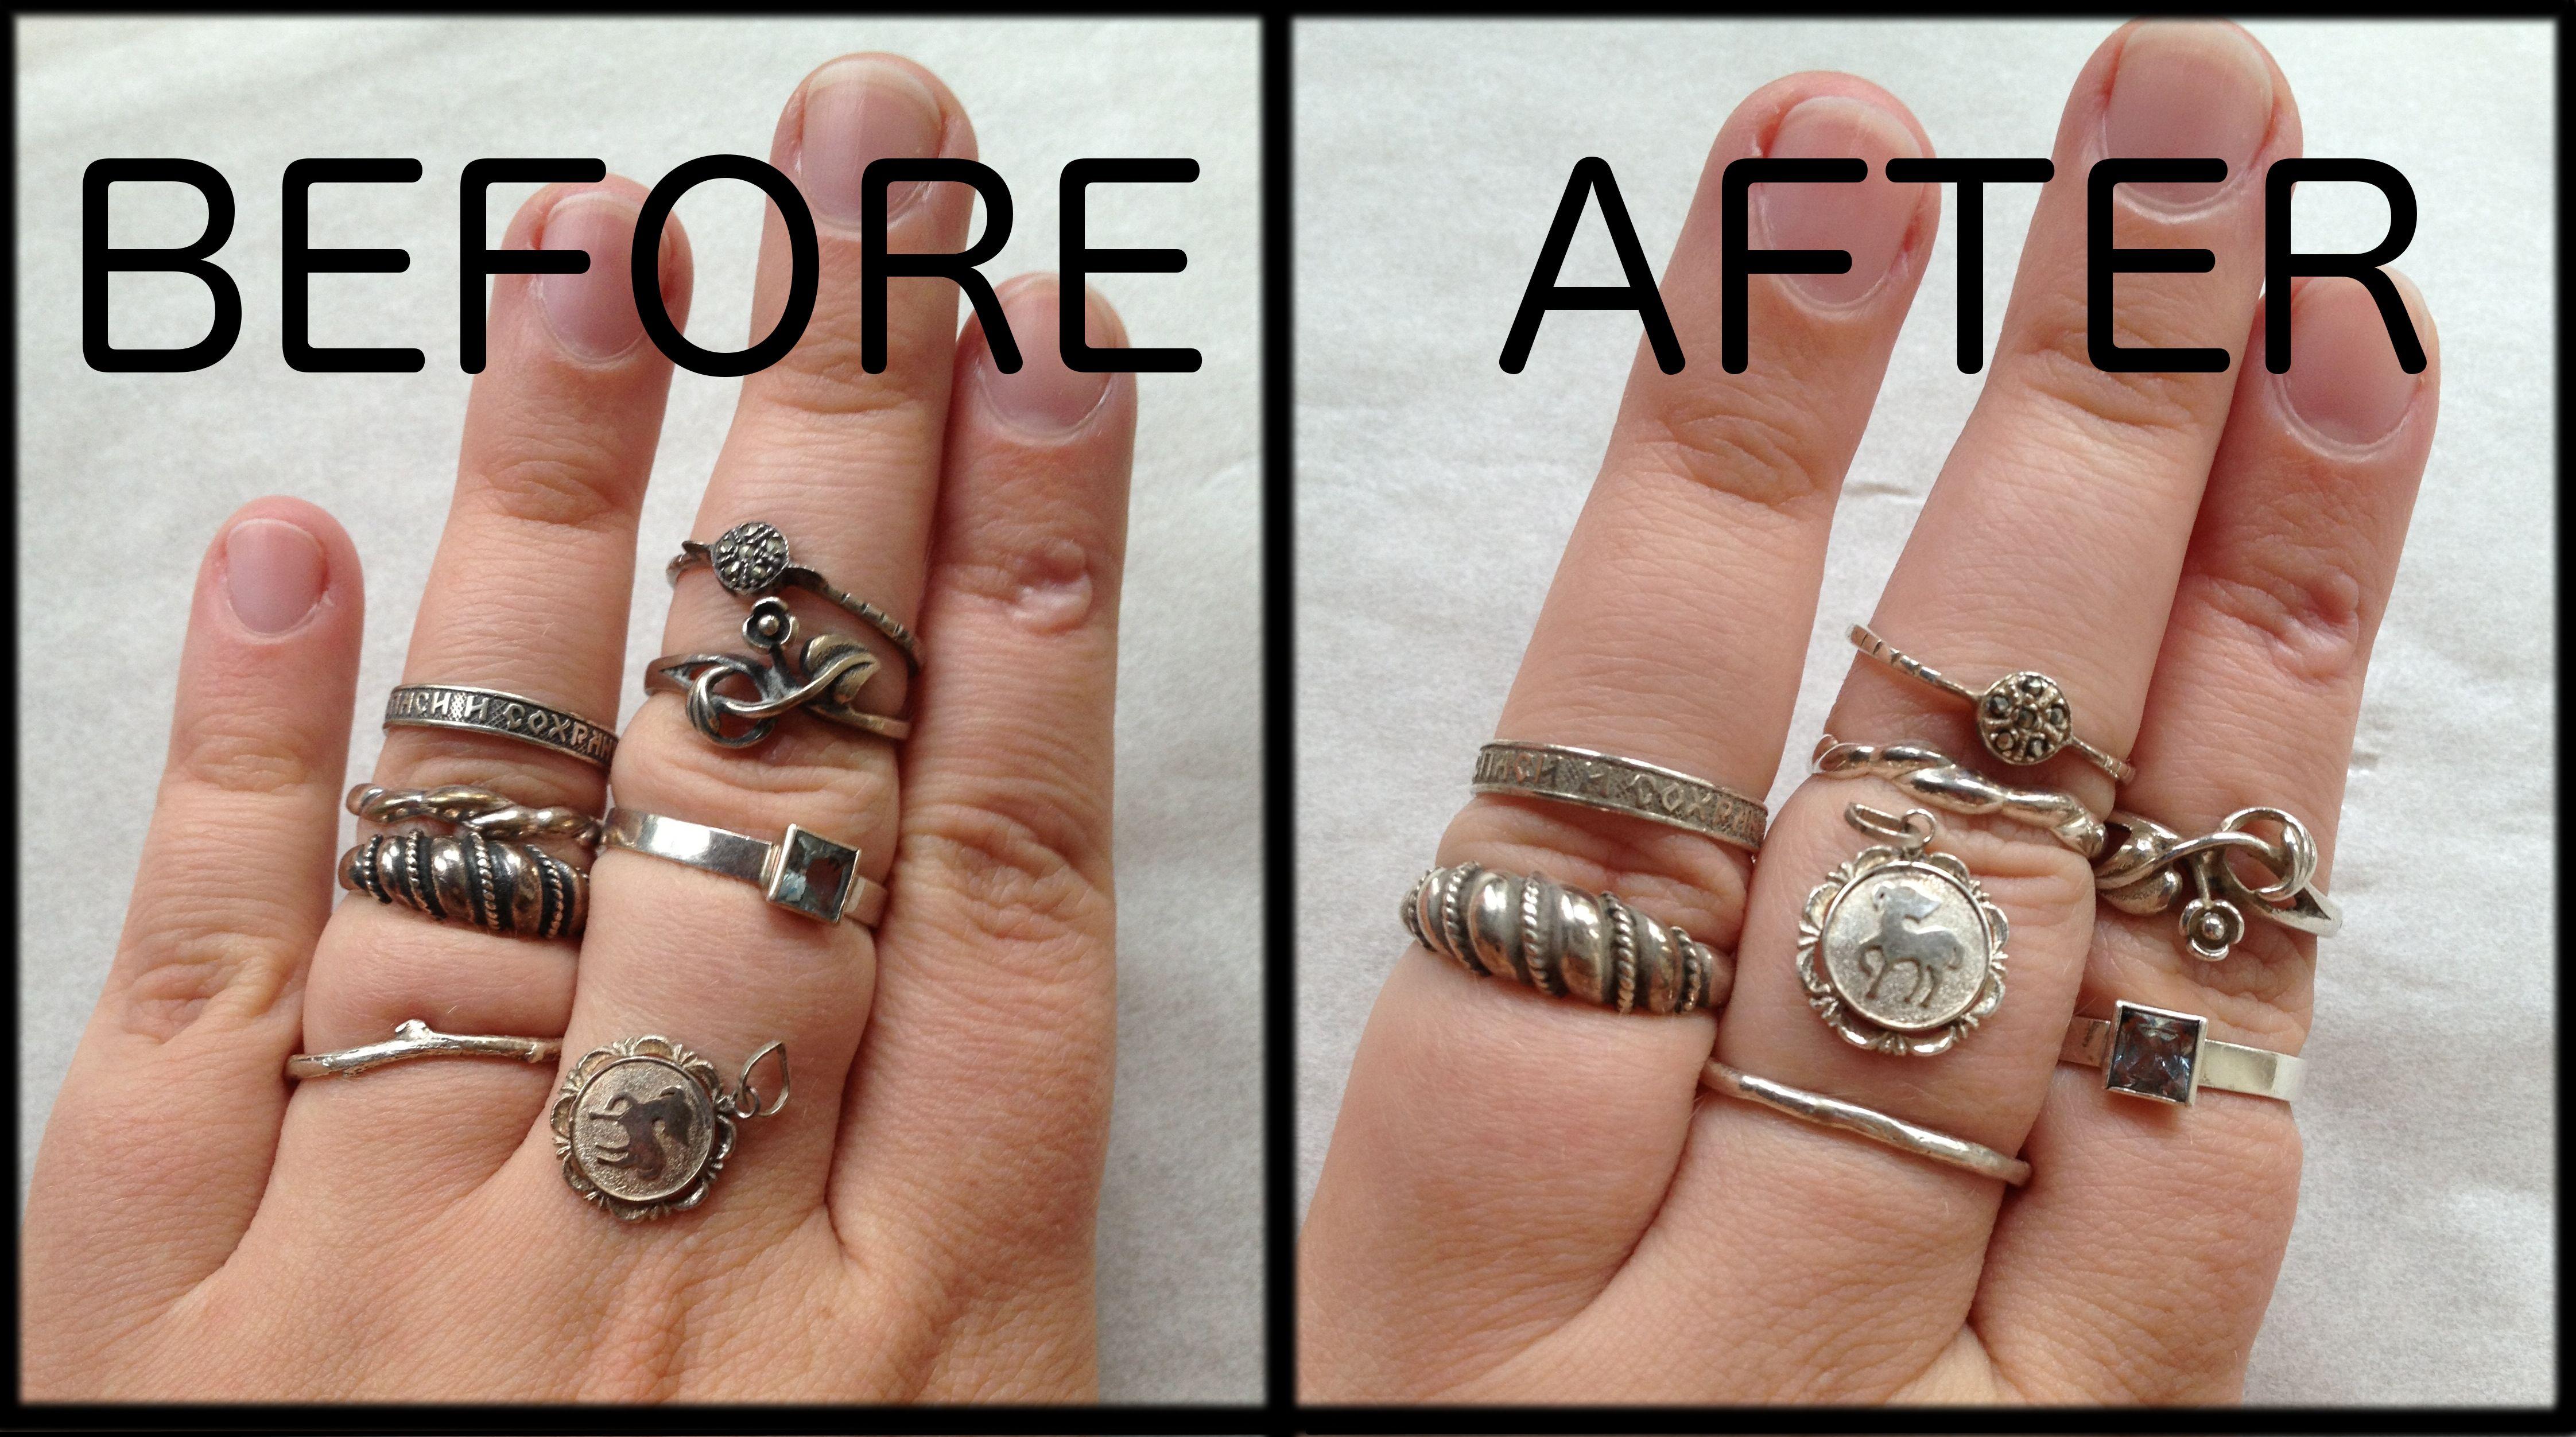 Reversing Tarnishing On Silver Jewelry Attempt 1 Cleaning Silver Jewelry Clean Tarnished Silver Jewelry Sterling Silver Jewelry Cleaner